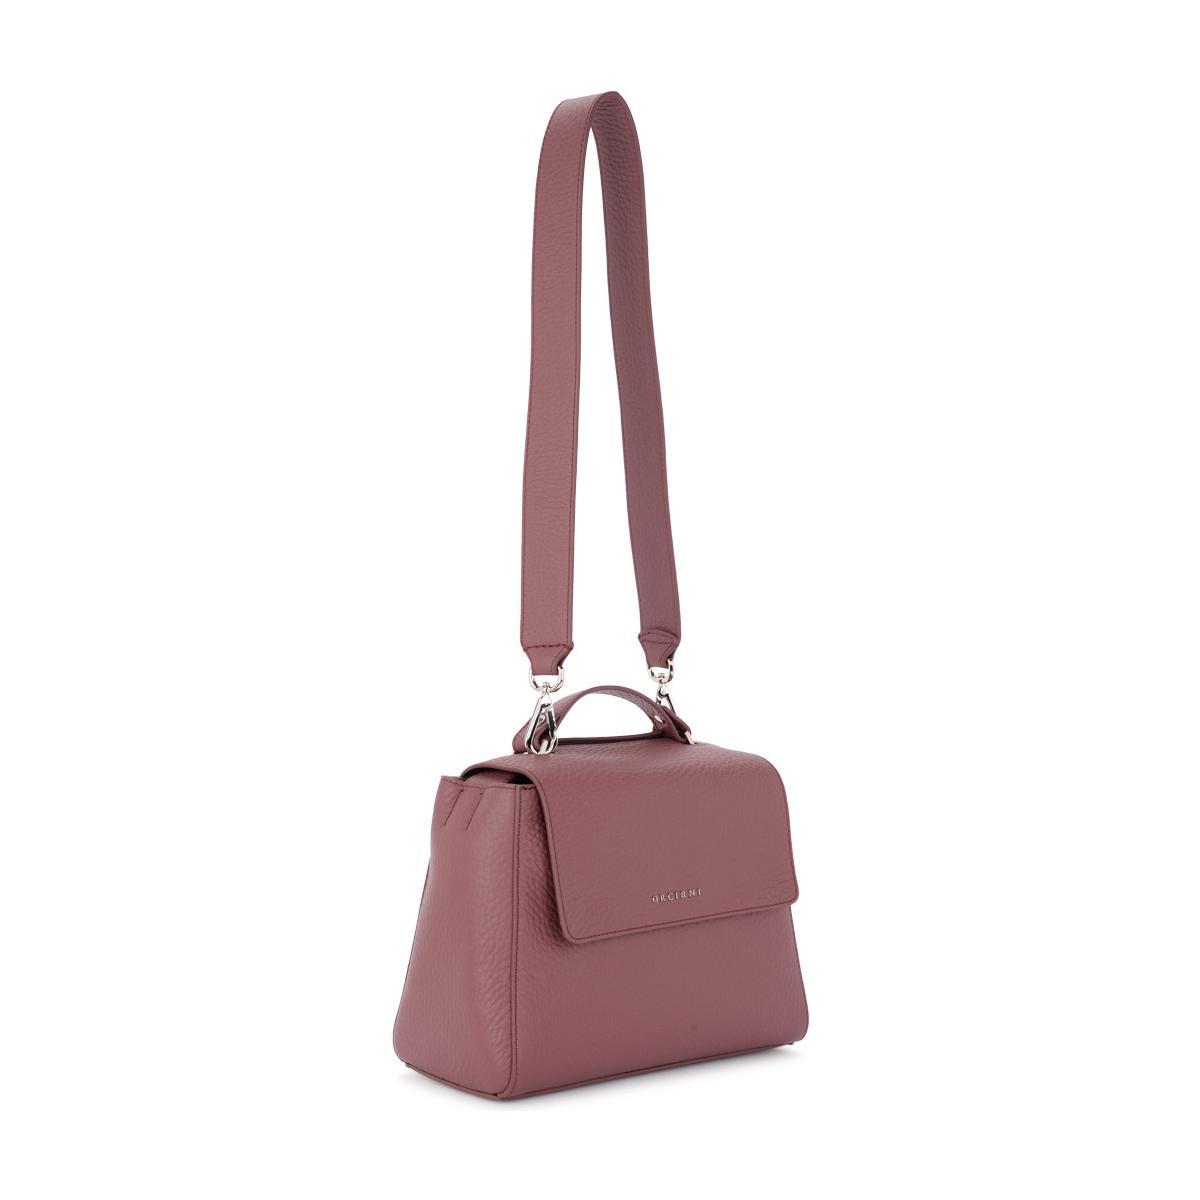 Orciani - Sveva Small Terracotta Tumbled Leather Handbag Women s Handbags  In Red for Men - Lyst. View fullscreen 63f5c25151ee4